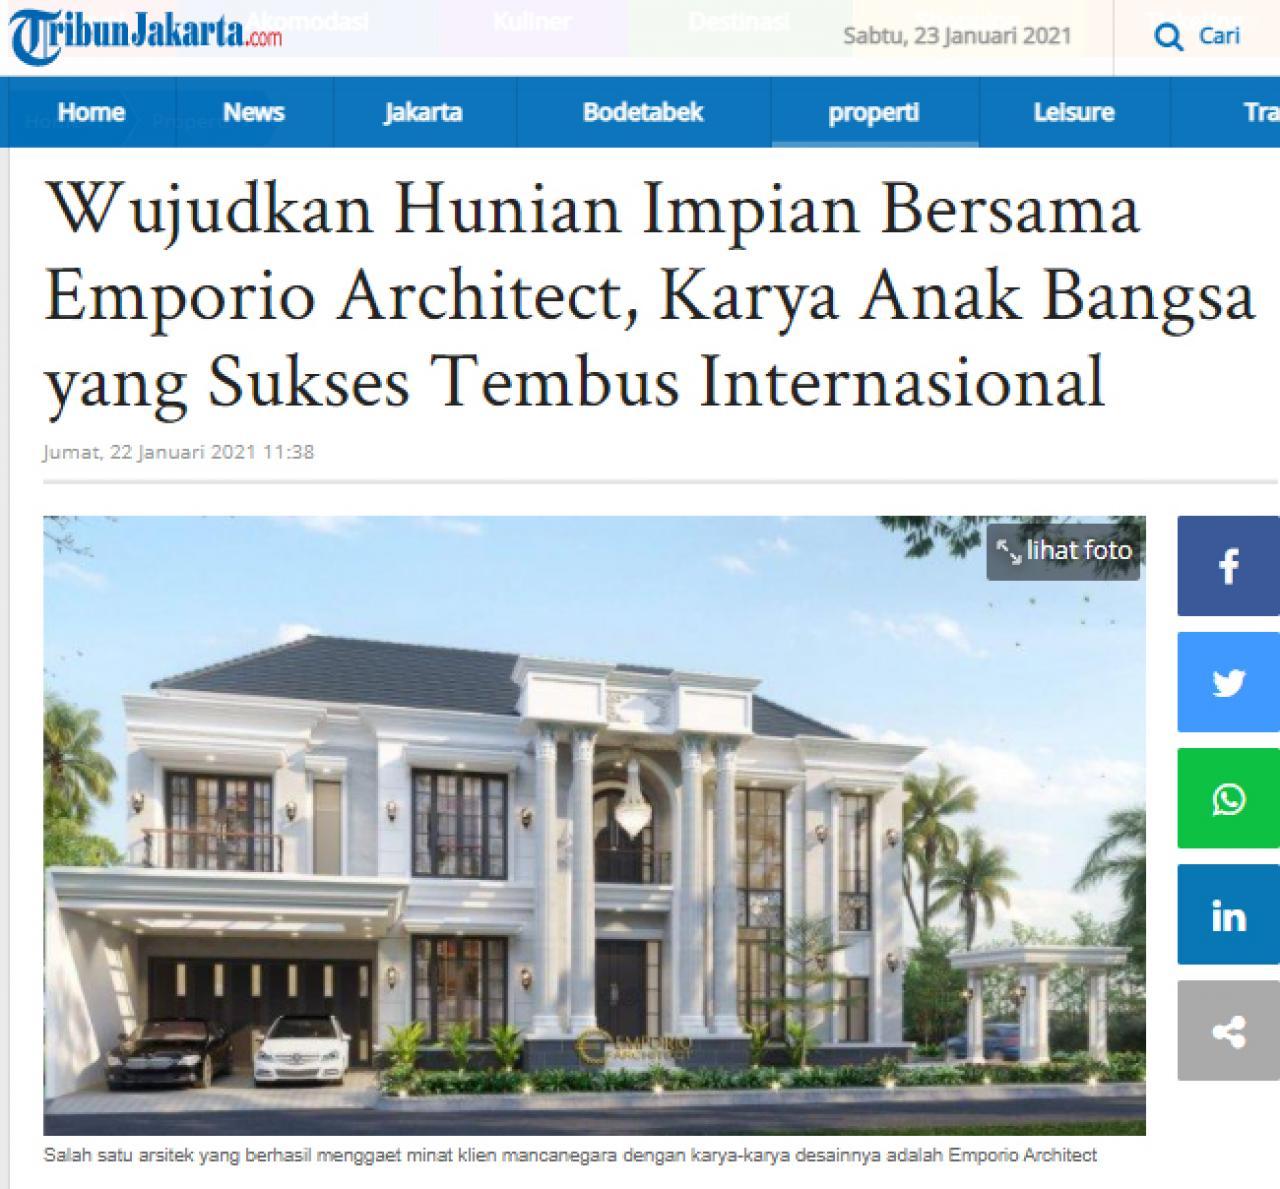 Ulasan Media TribunJakarta.com - Wujudkan Hunian Impian Bersama Emporio Architect, Karya Anak Bangsa yang Sukses Tembus Internasional